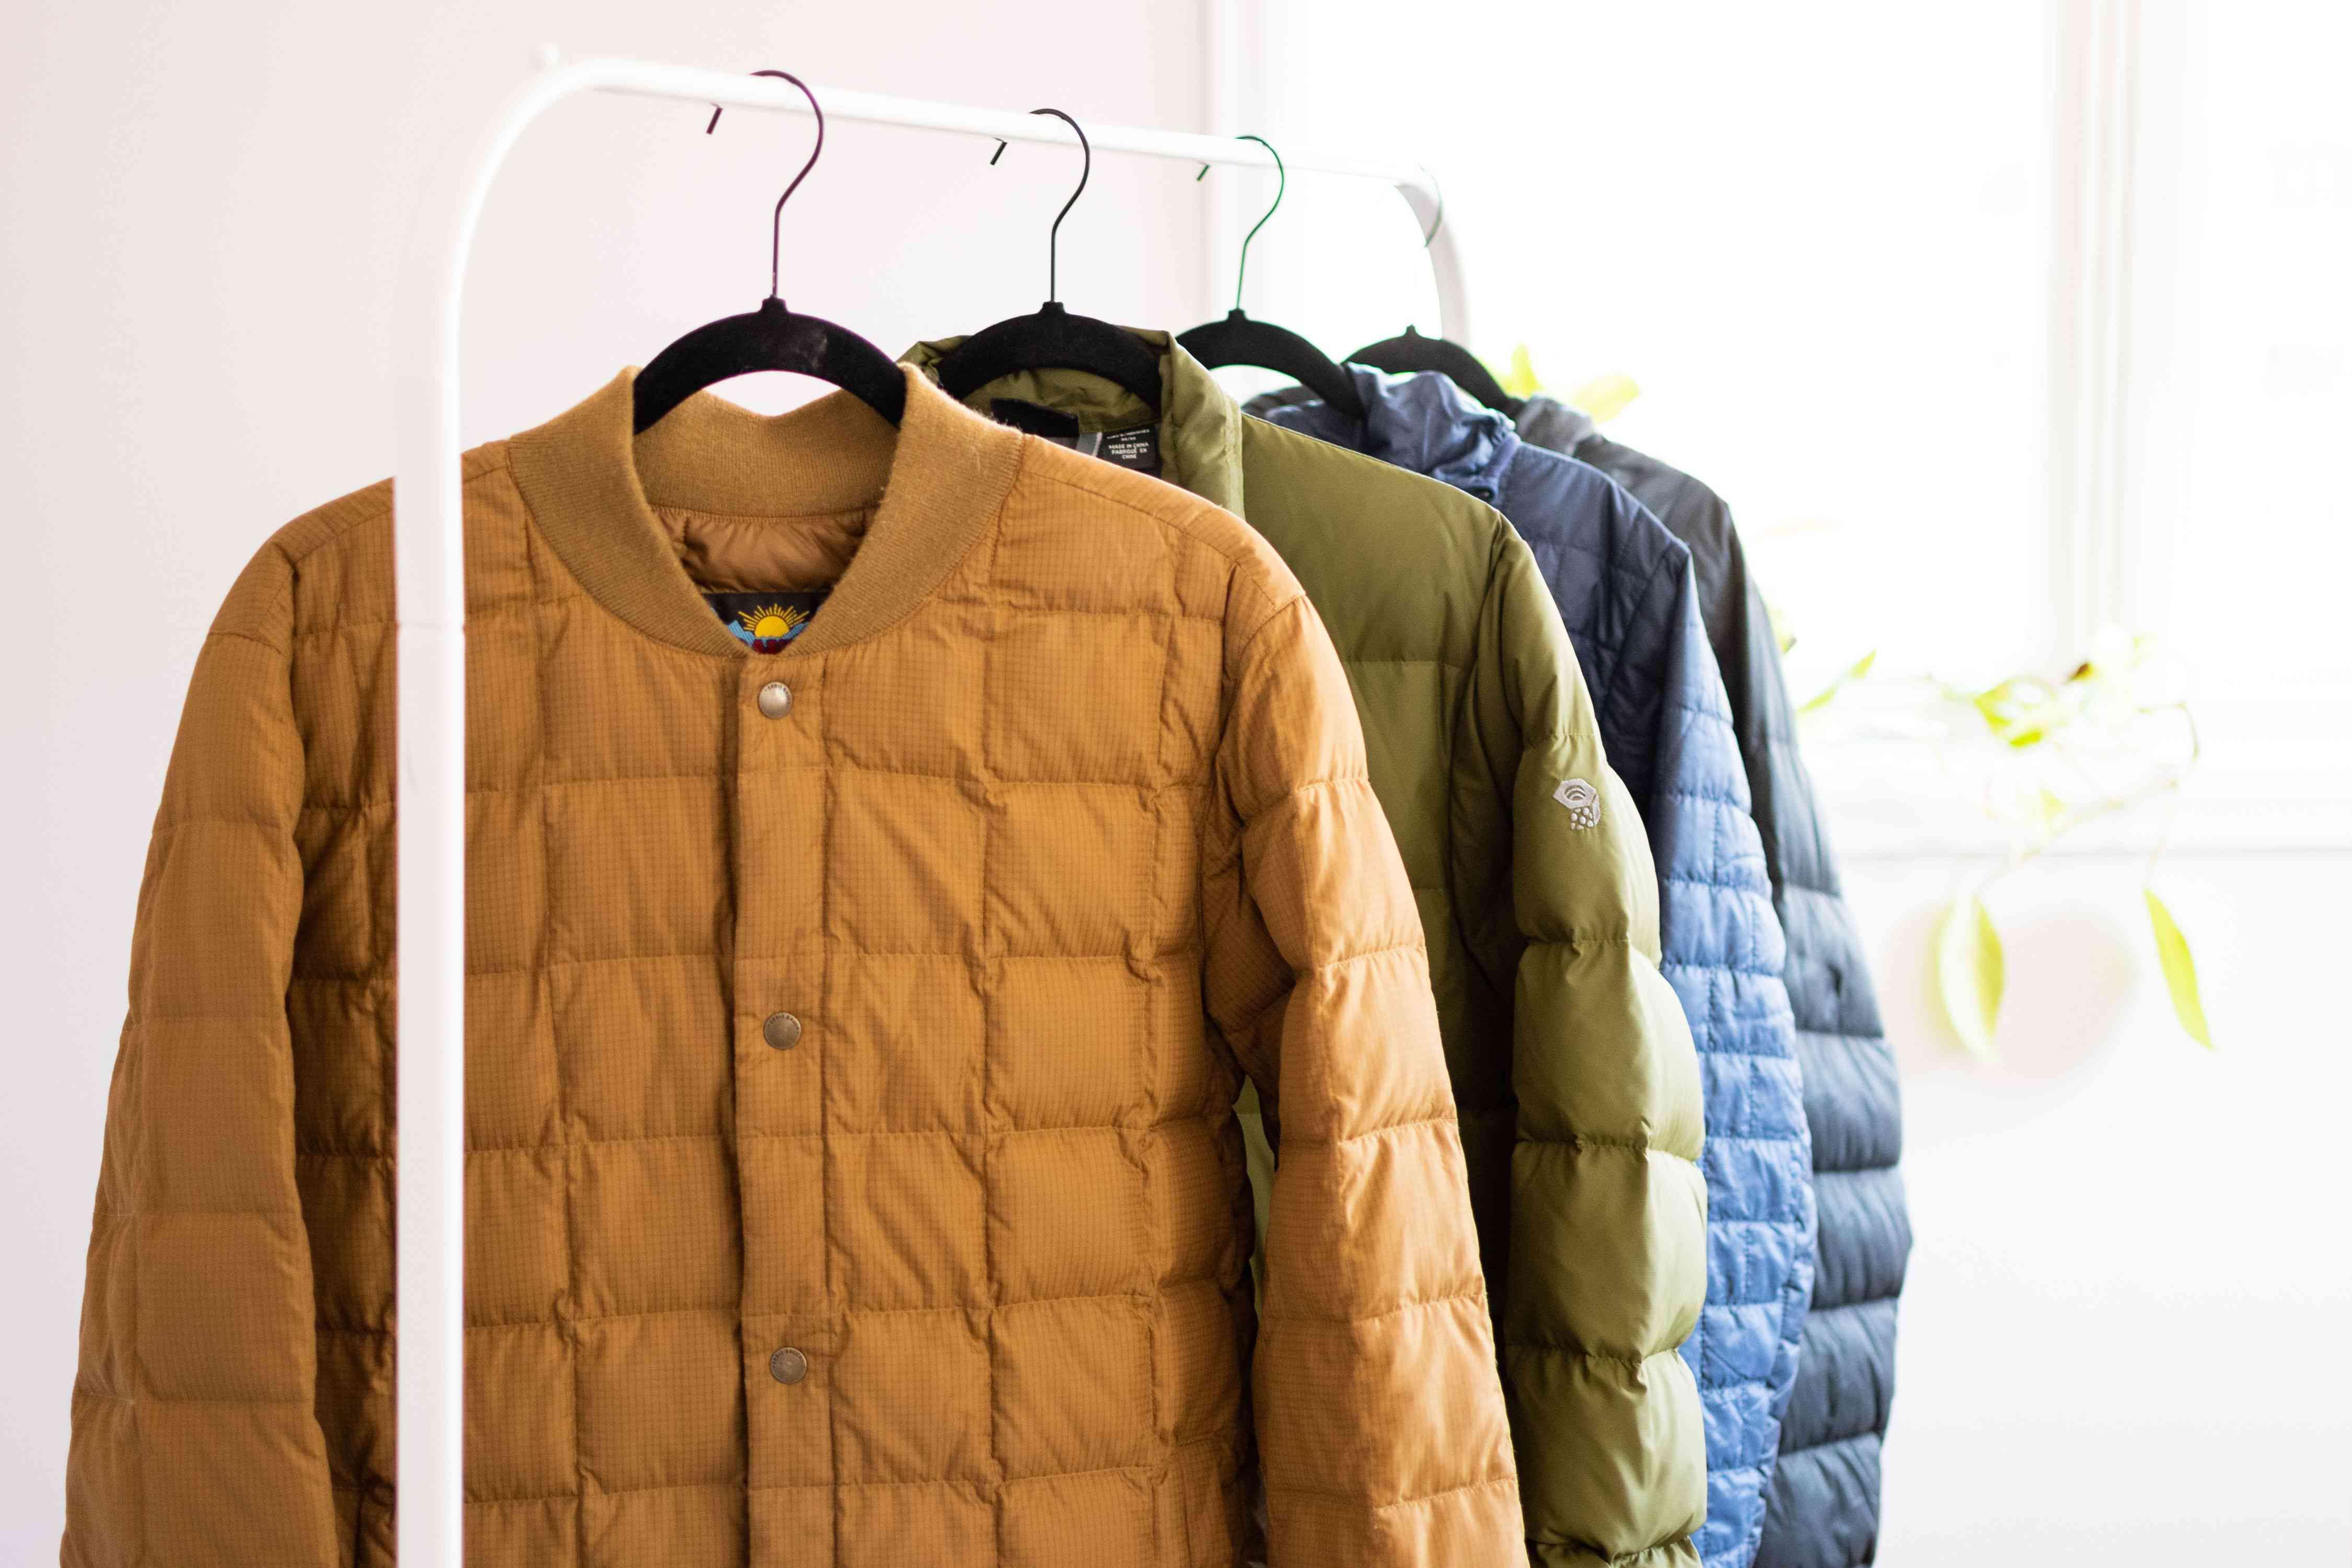 Hang drying the down coat